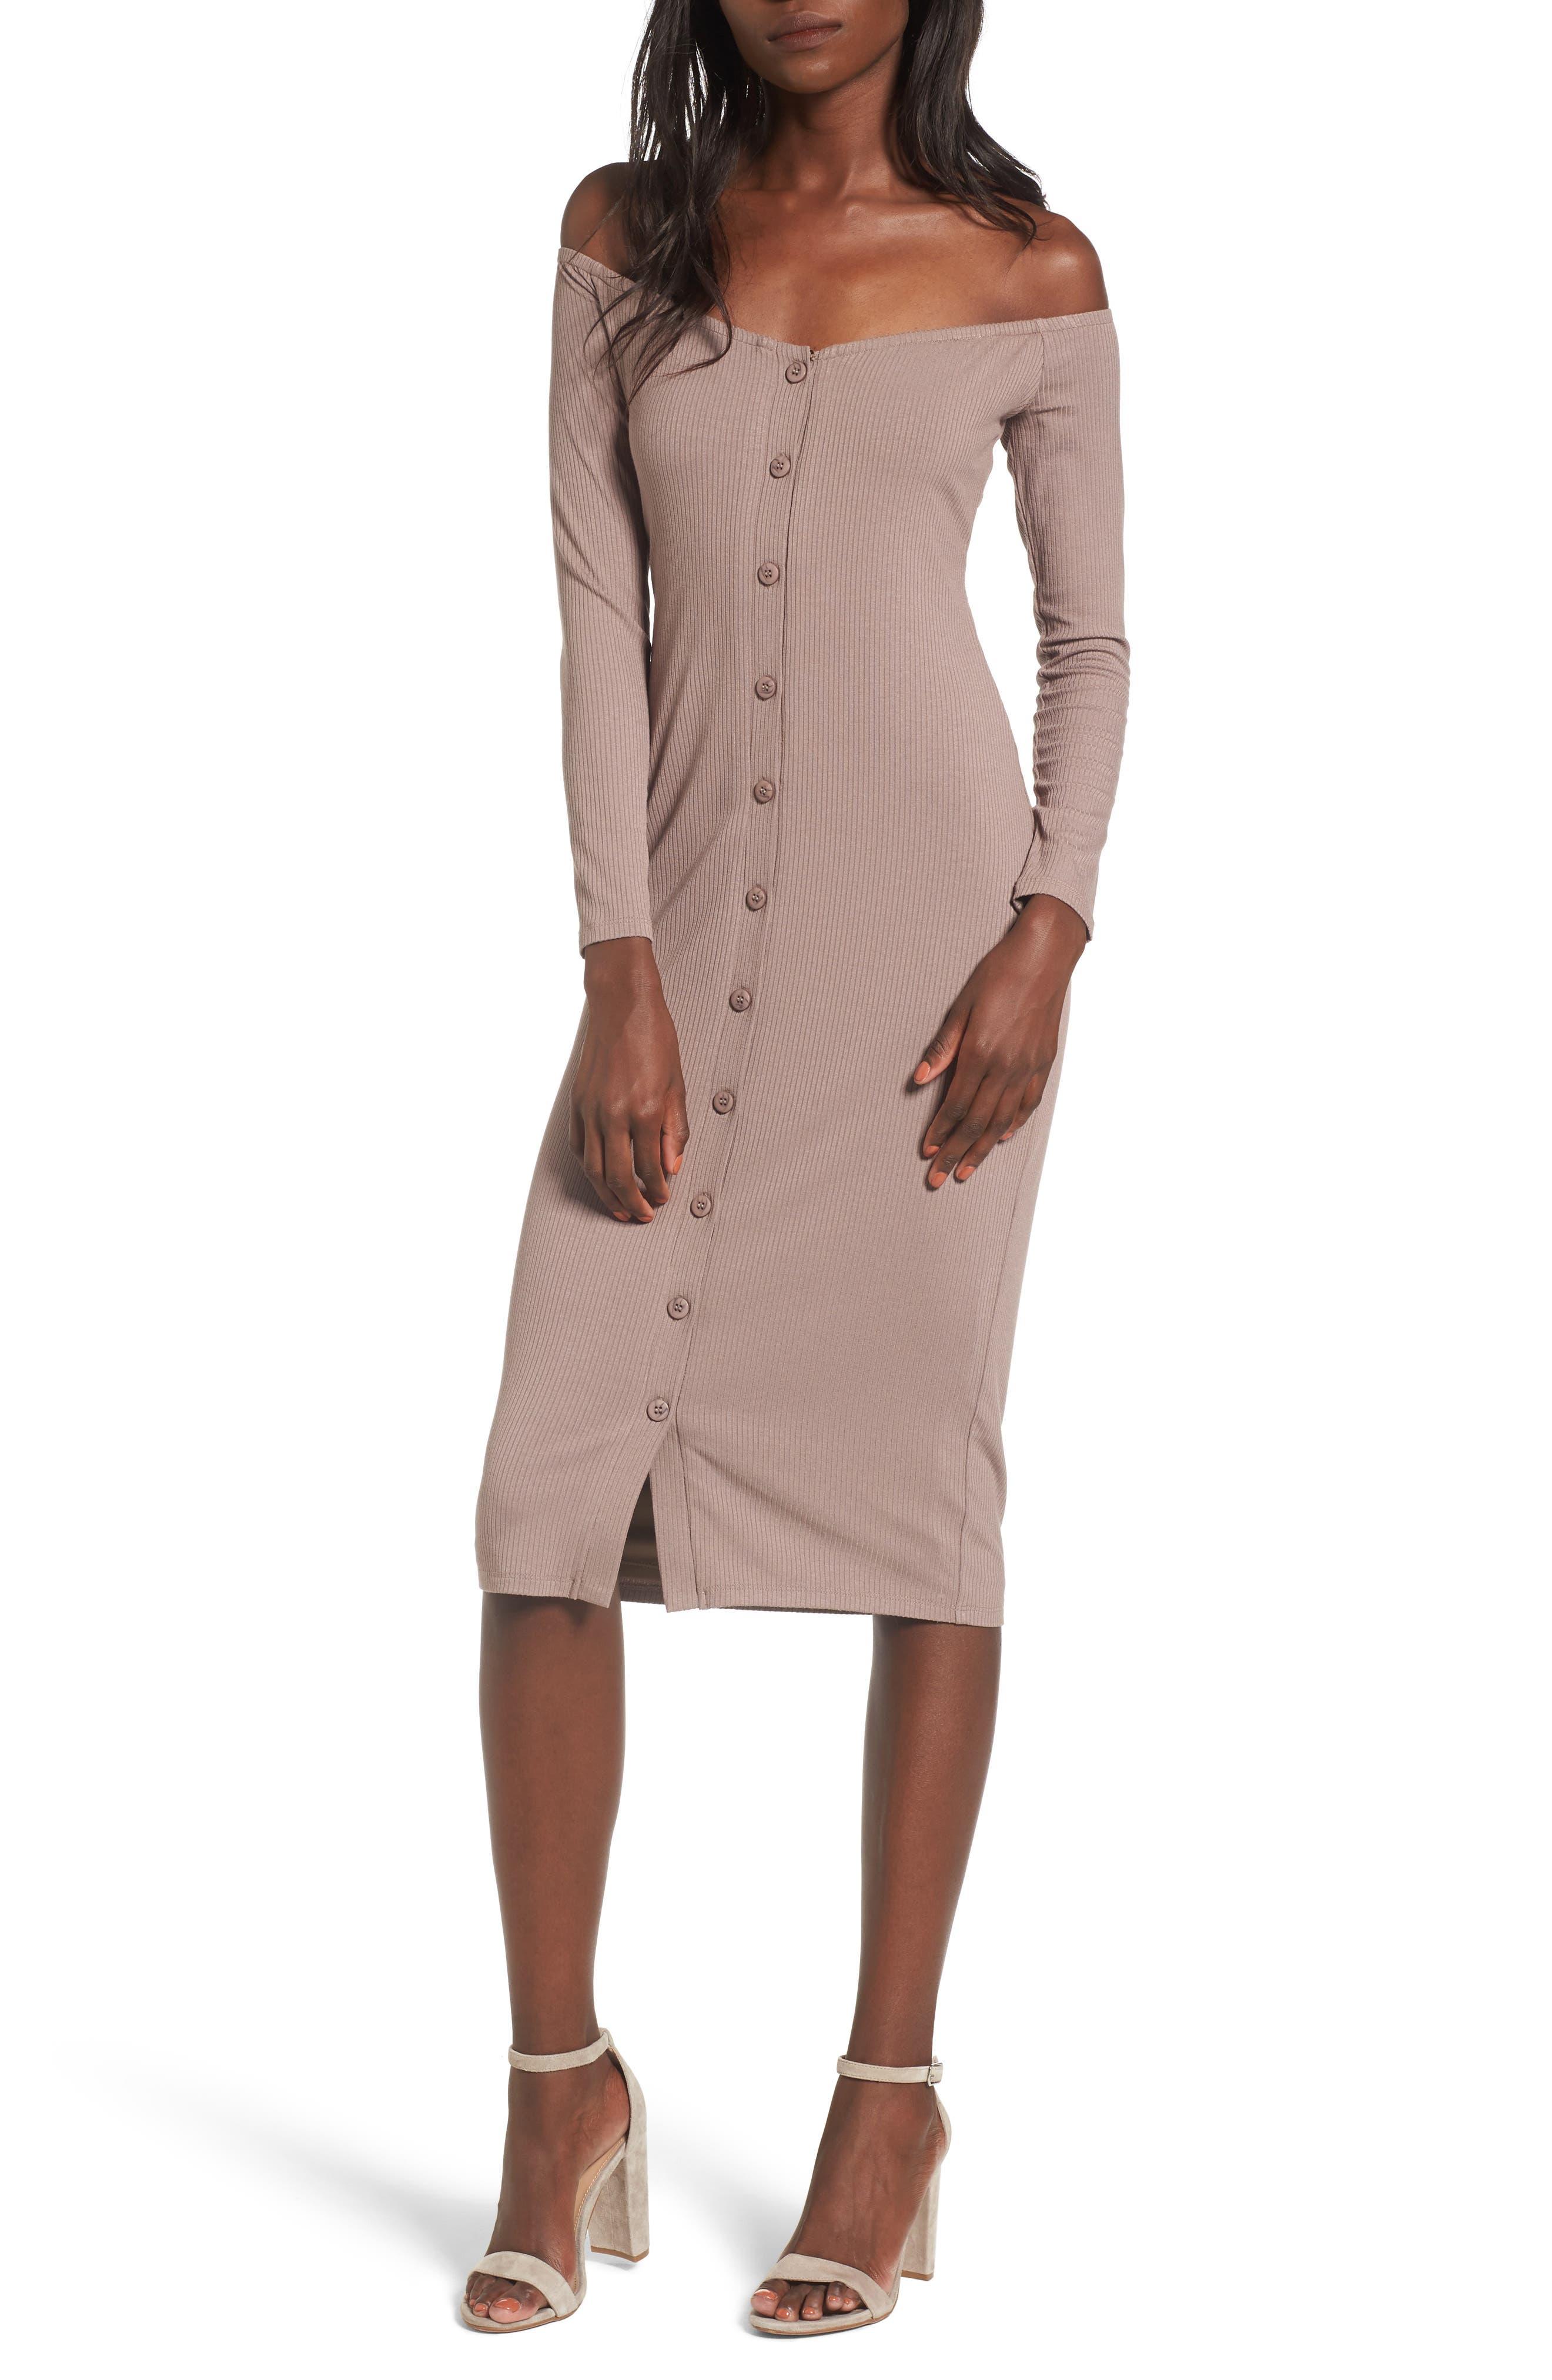 Albany Off the Shoulder Midi Dress,                         Main,                         color, 020